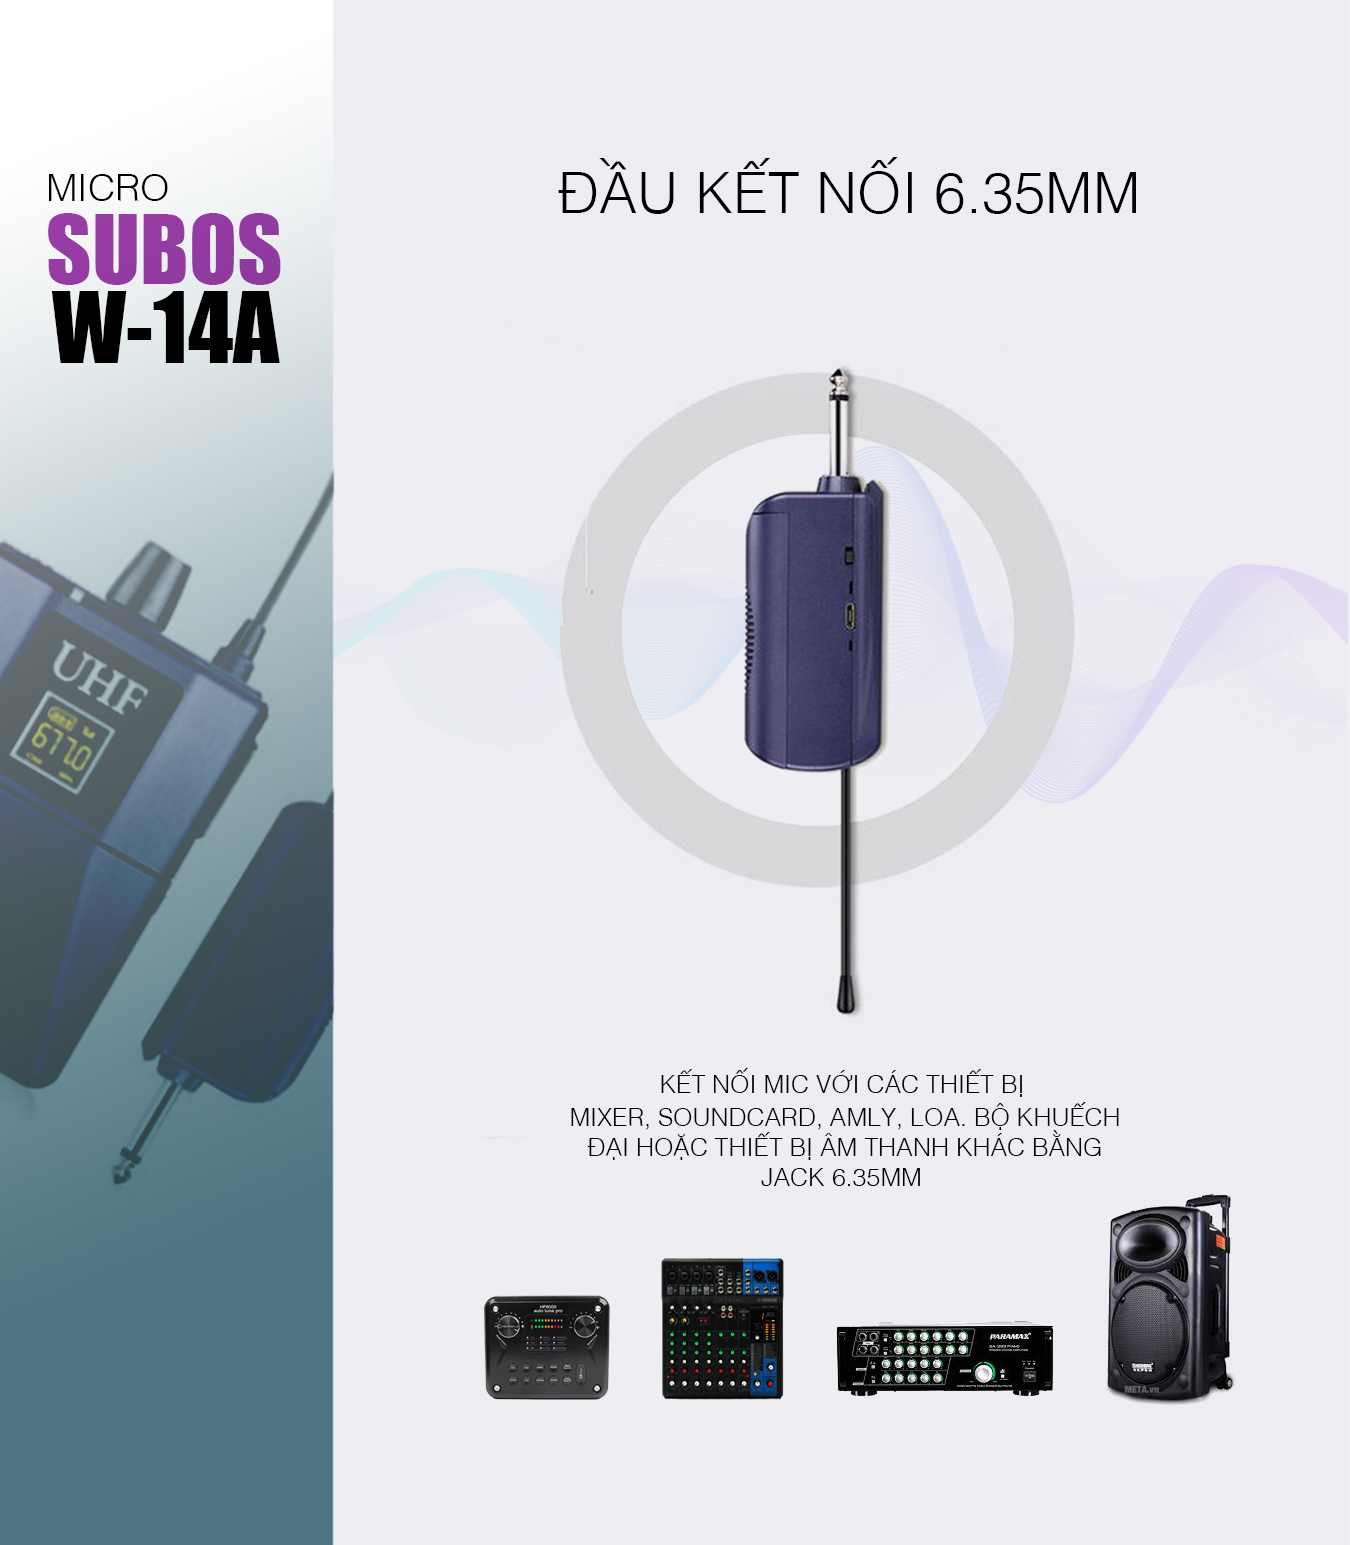 Microphone Wireless SUBOS W14A - Micro đeo tai livestream bán hàng